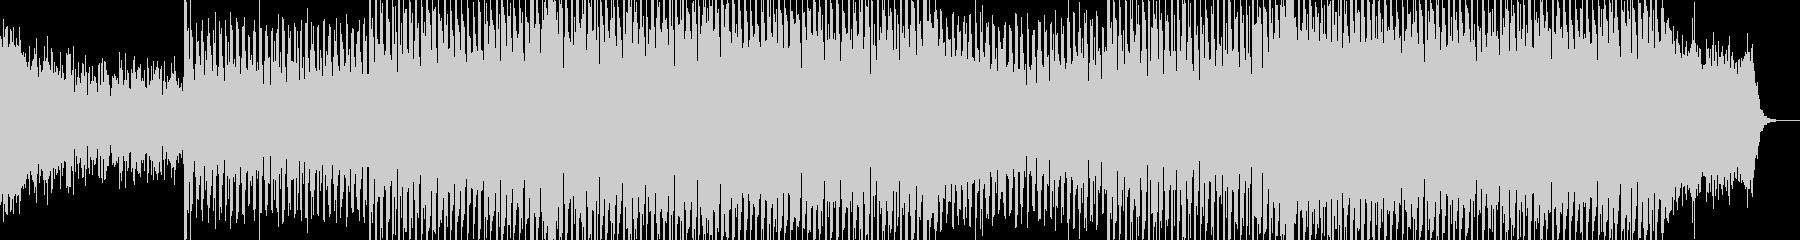 EDMポップで明るいクラブ系-121の未再生の波形